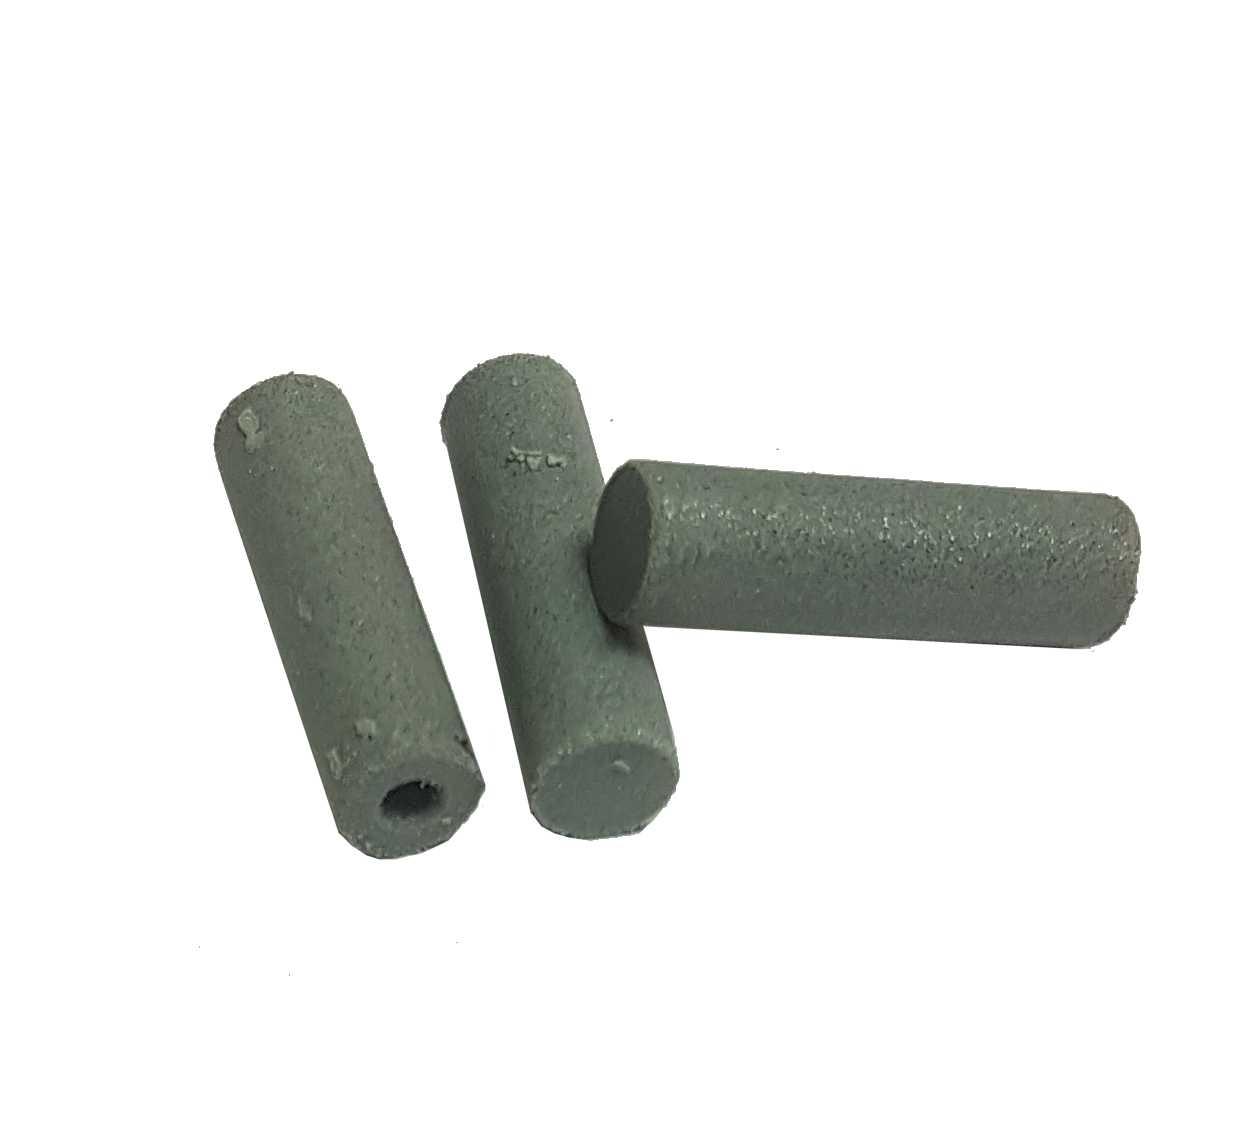 0,45€ Goma cilindrica abrasiva gris